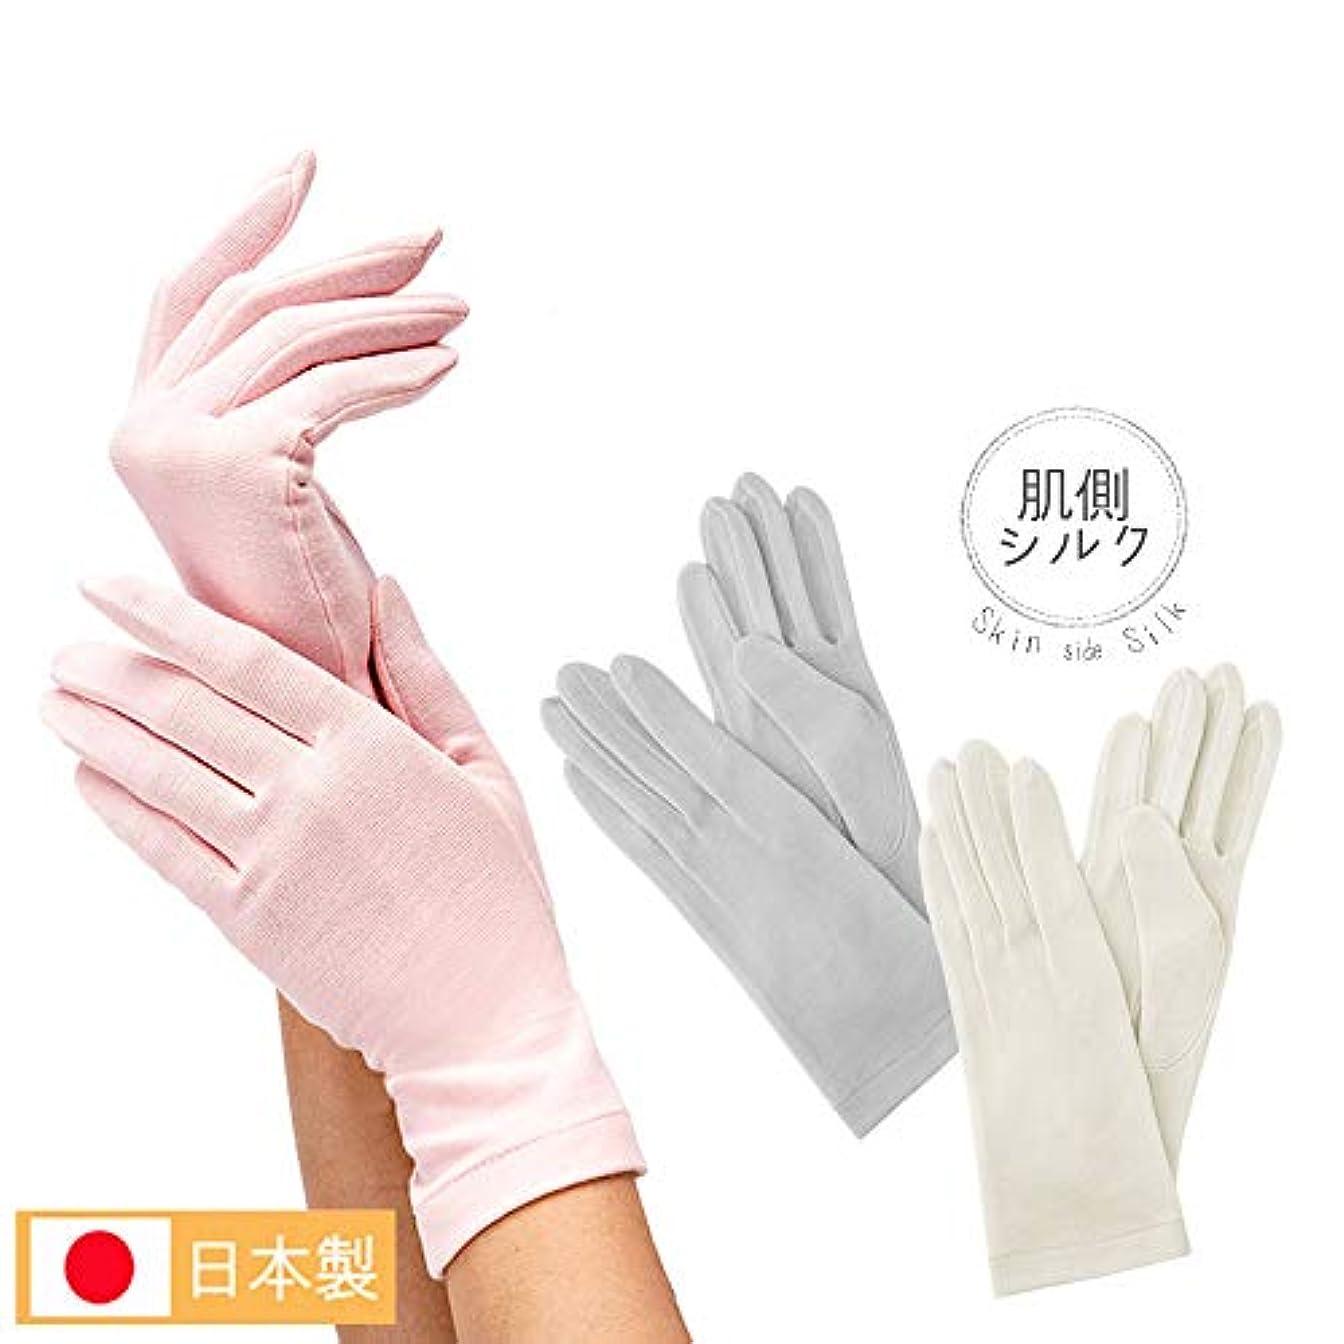 G12-0071_IV 就寝用 裏シルクうるおい手袋 あったか 薄い 手荒れ ハンドケア 保湿 レディース 女性 おやすみ 寝るとき 日本製 アイボリー